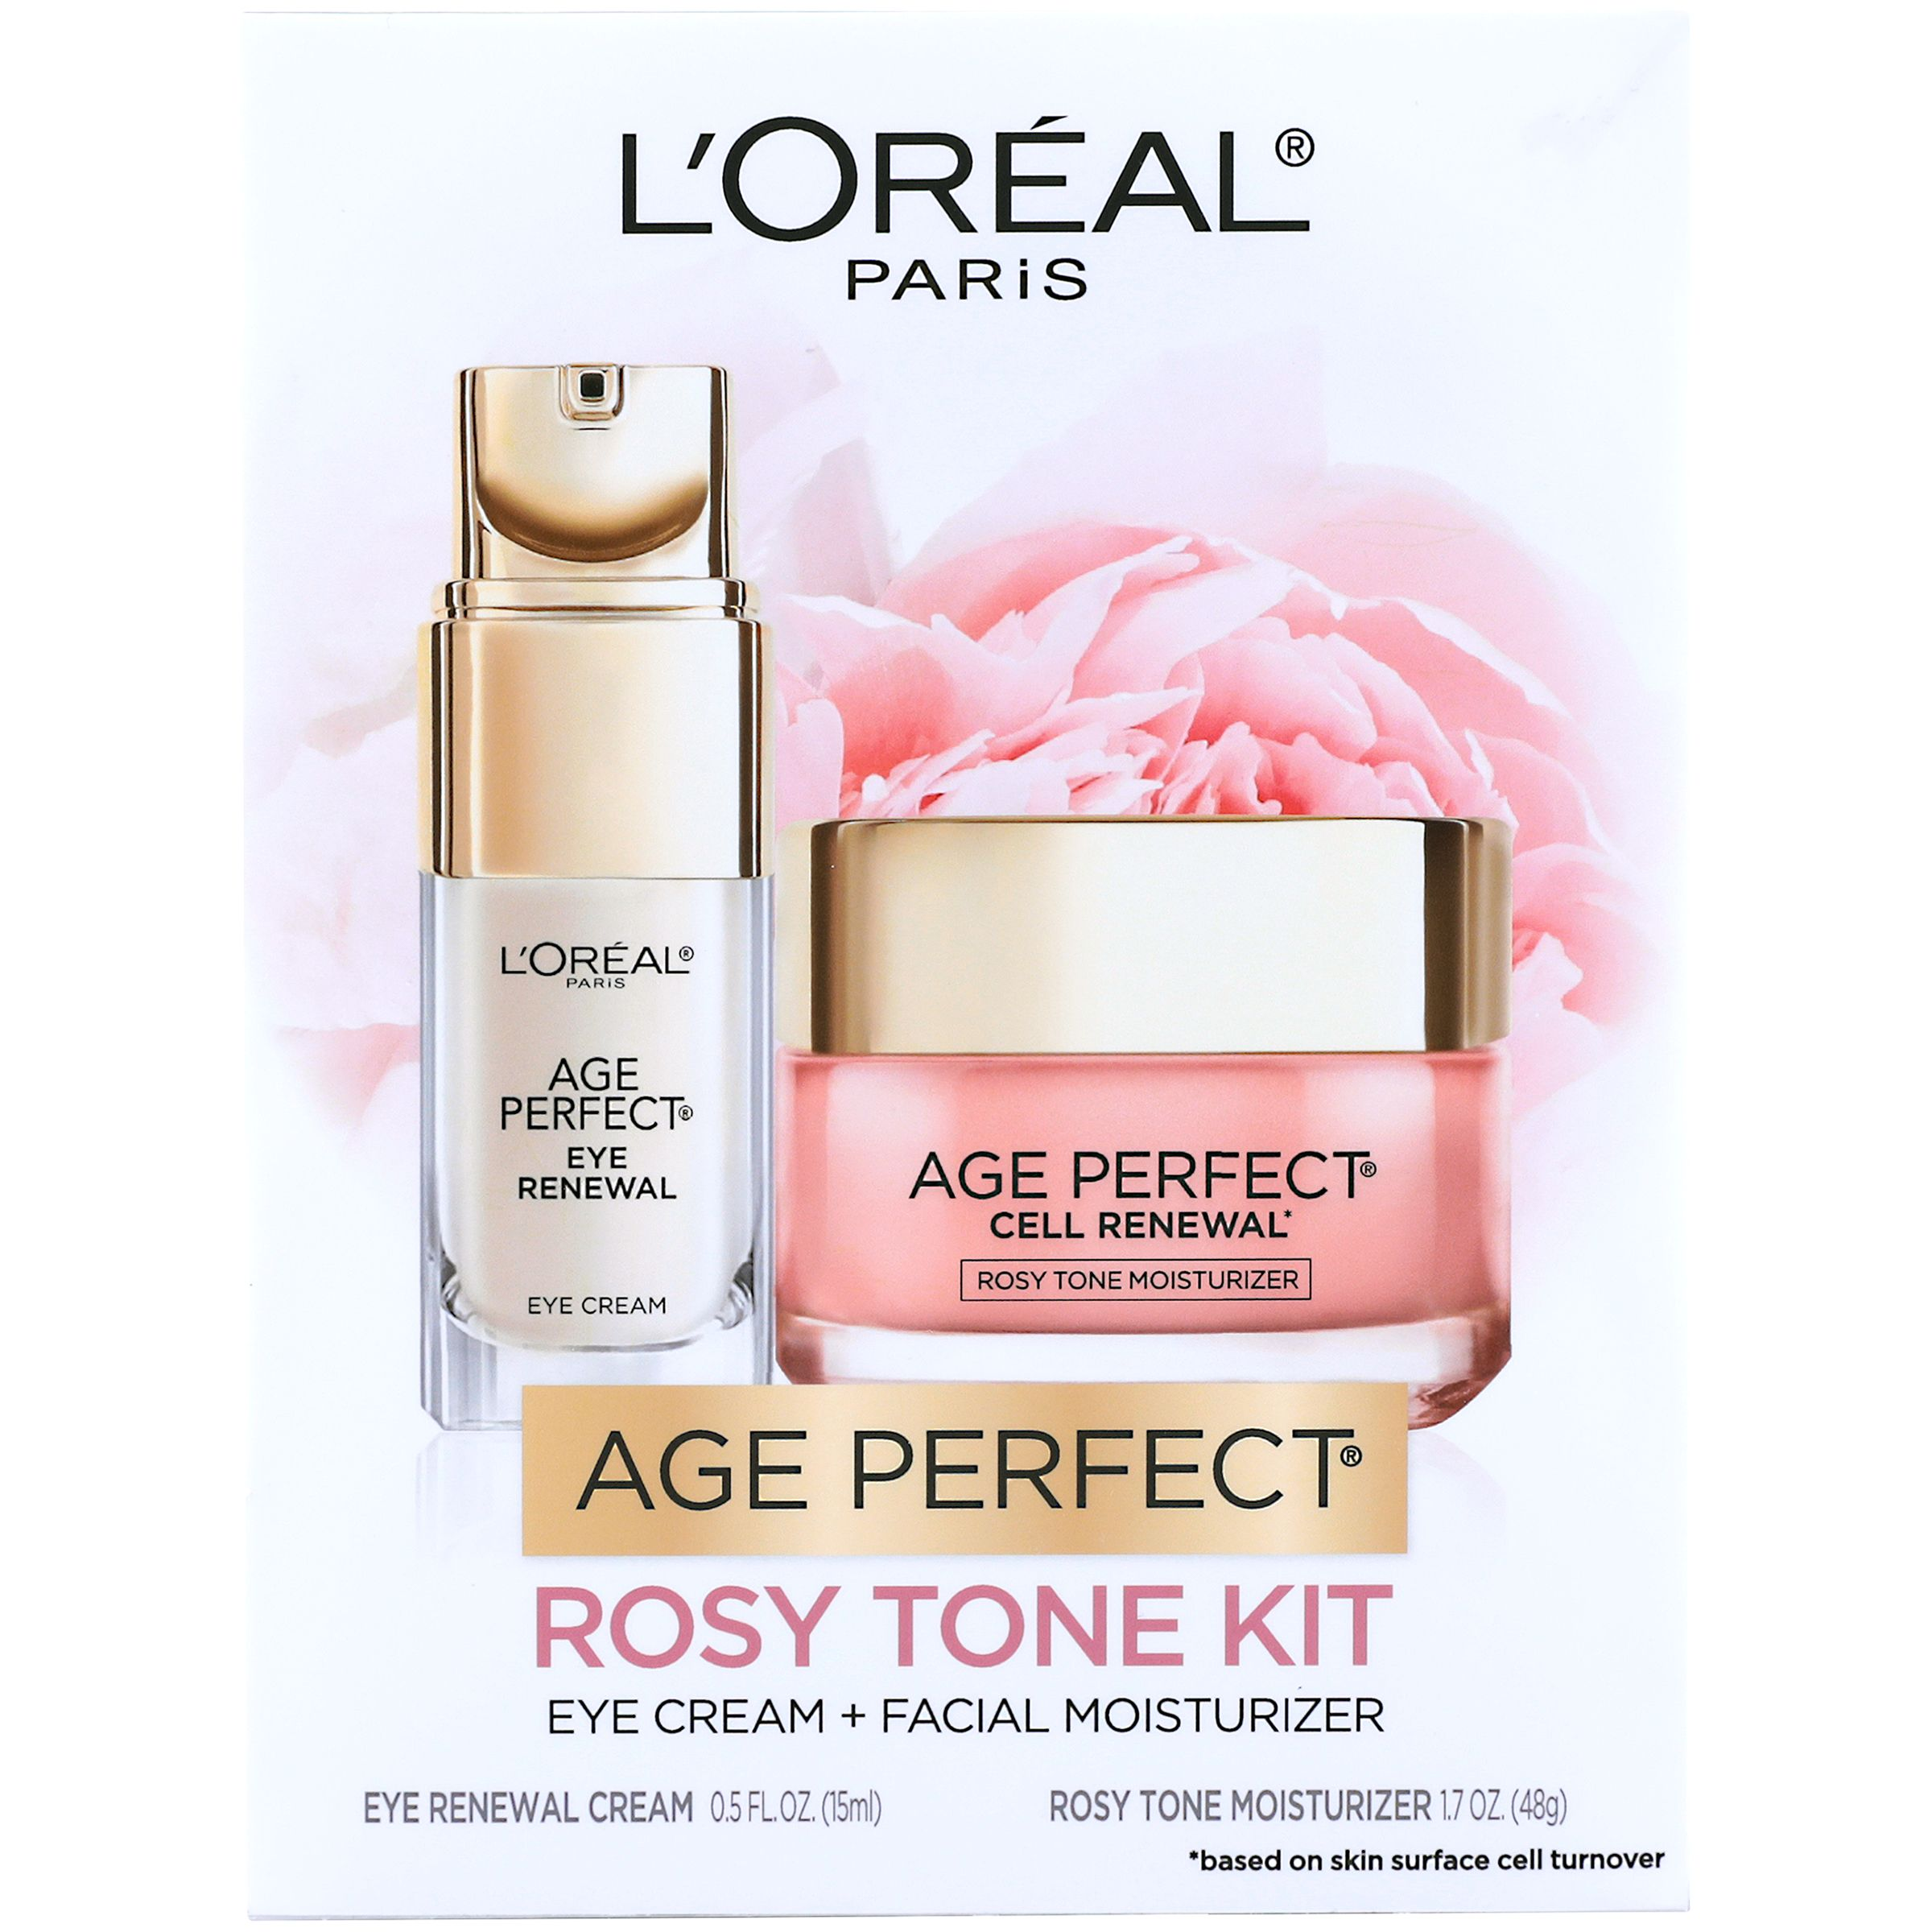 L'Oreal Paris Age Perfect Eye Renewal and Age Perfect Cell Renewal